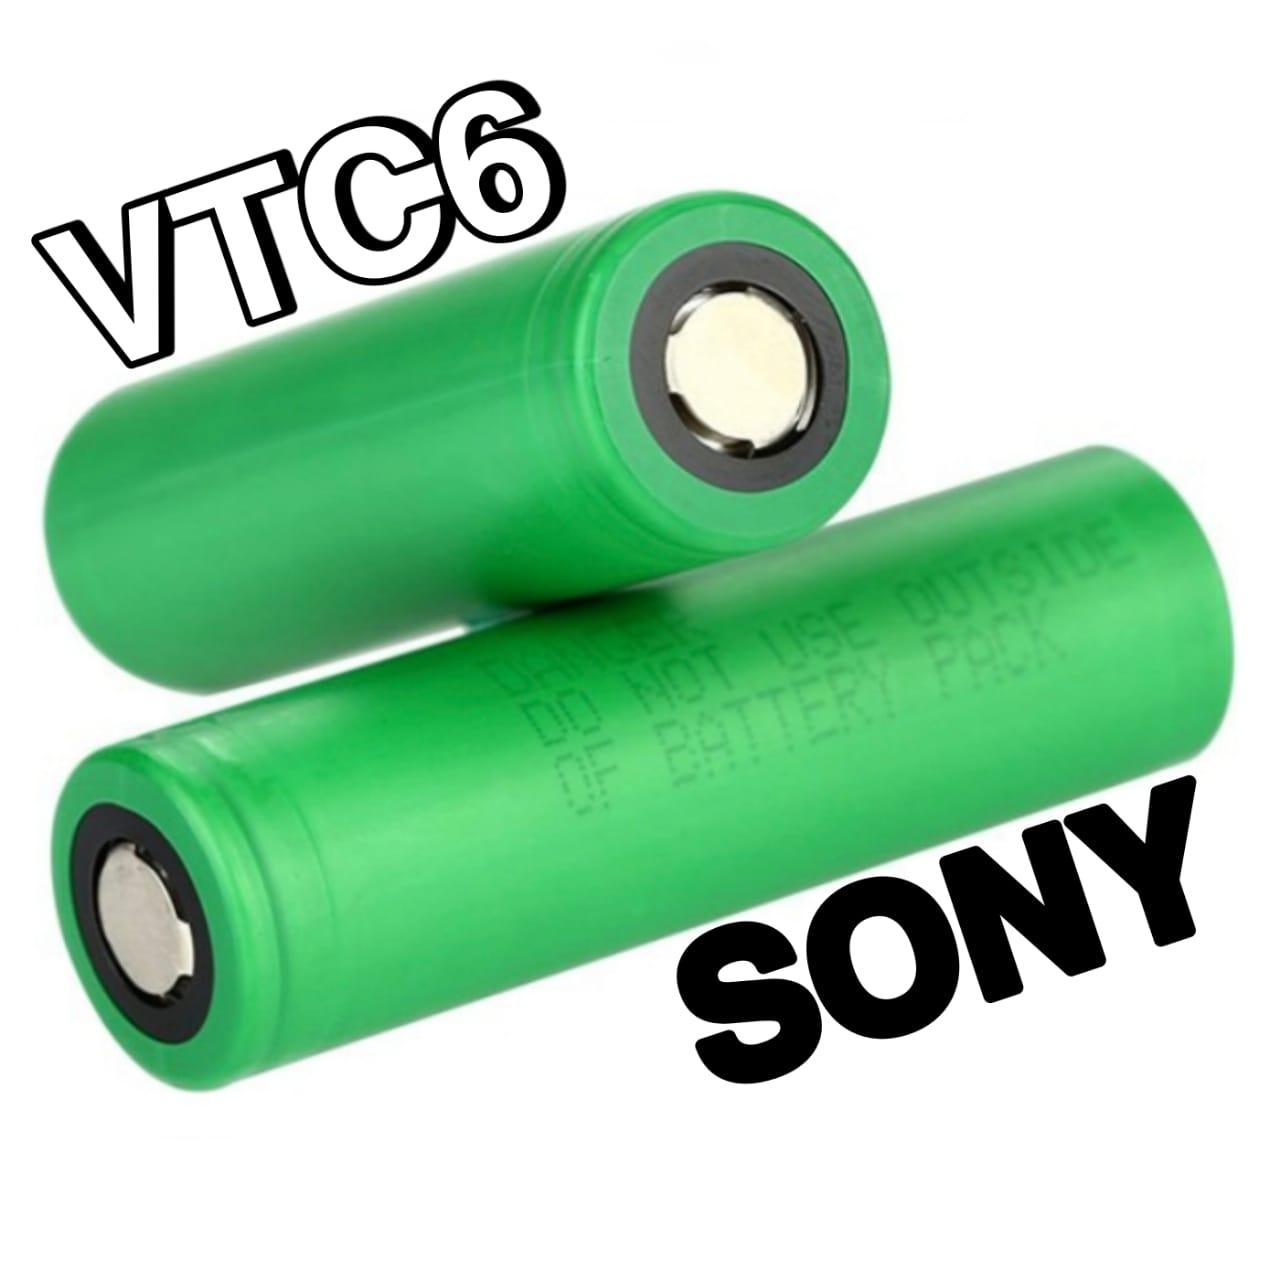 Bateria (18650) 3000mAh VTC6 Flat Top 30A High-Drain - SONY